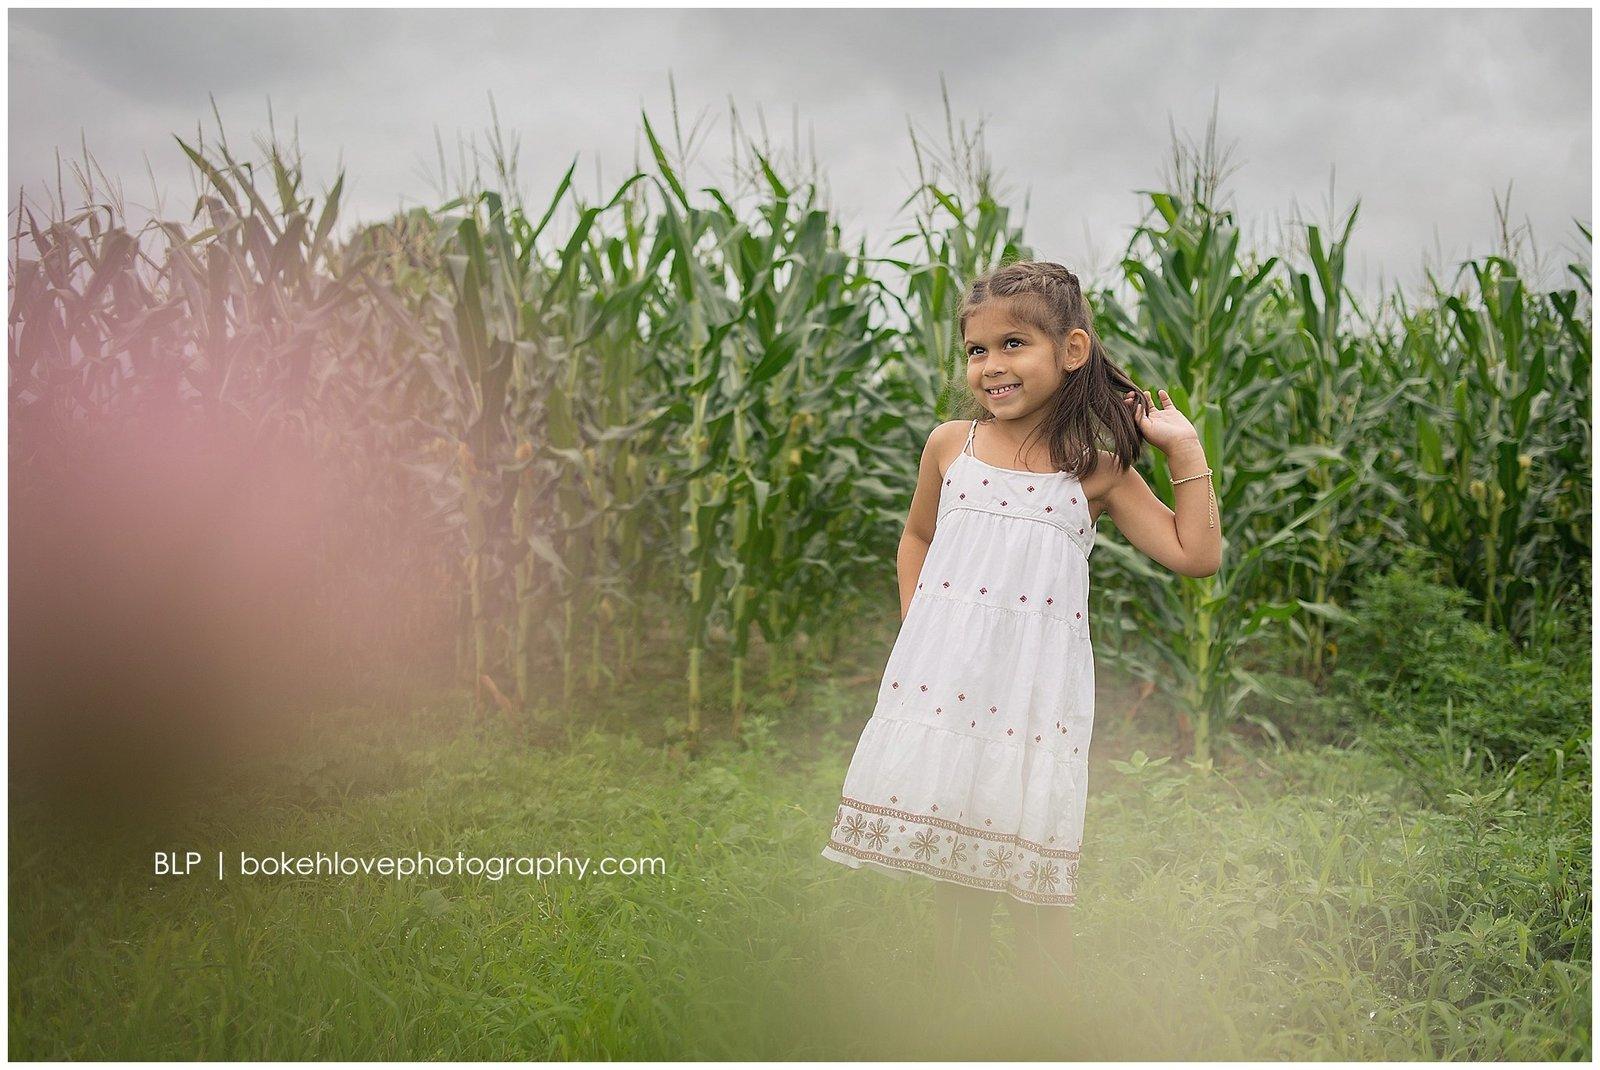 Bokeh_Love_Photography_Galloway_Professional_Photographer_0189